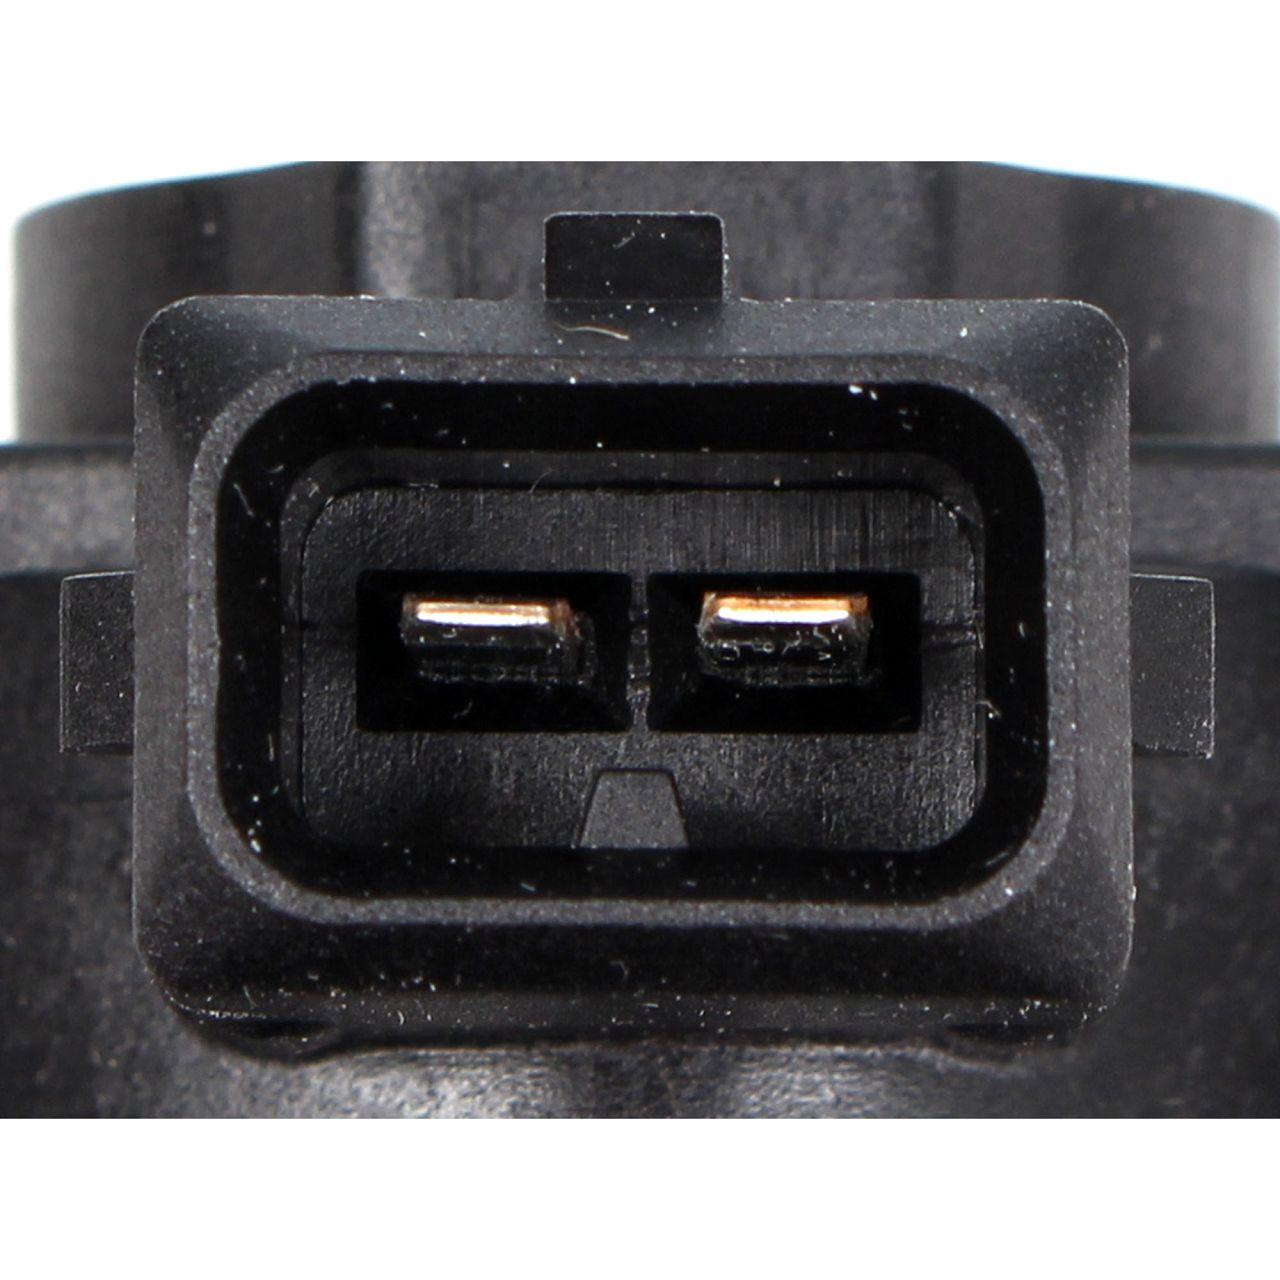 Druckwandler Turbolader OPEL Astra H Corsa D Meriva Zafira B 1.3/1.9 CDTI 5851073